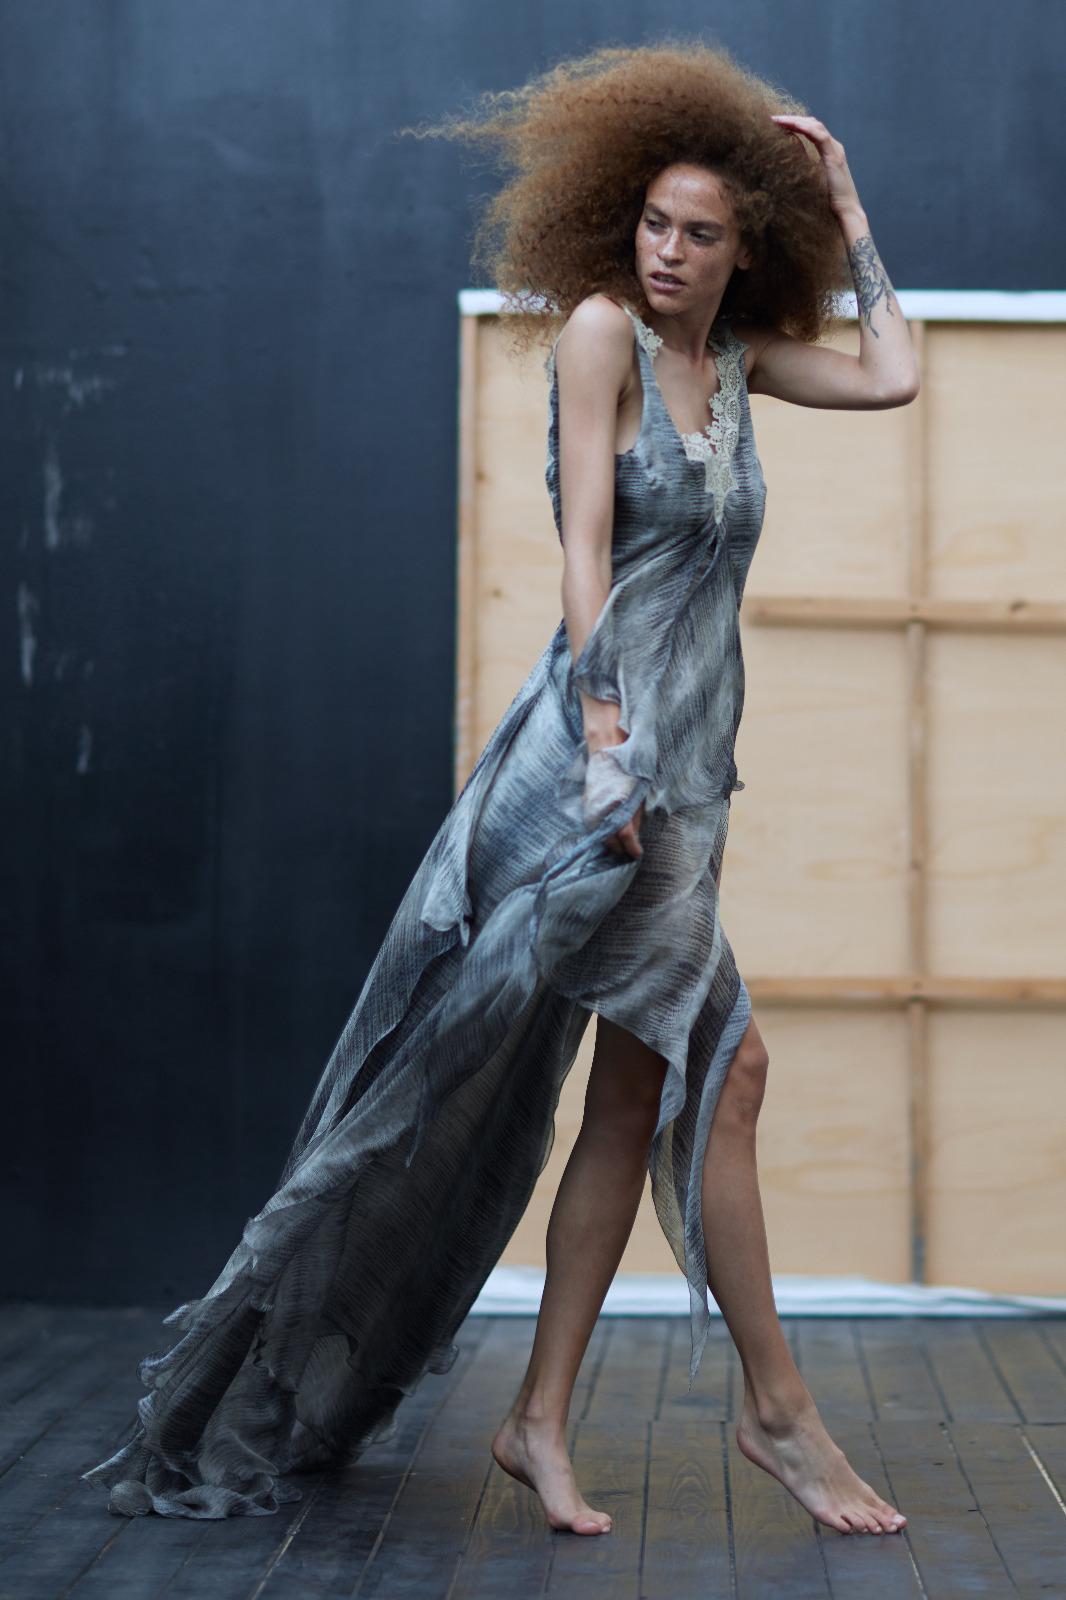 Fashion-editorial-mirko-burin-17-switch-magazine